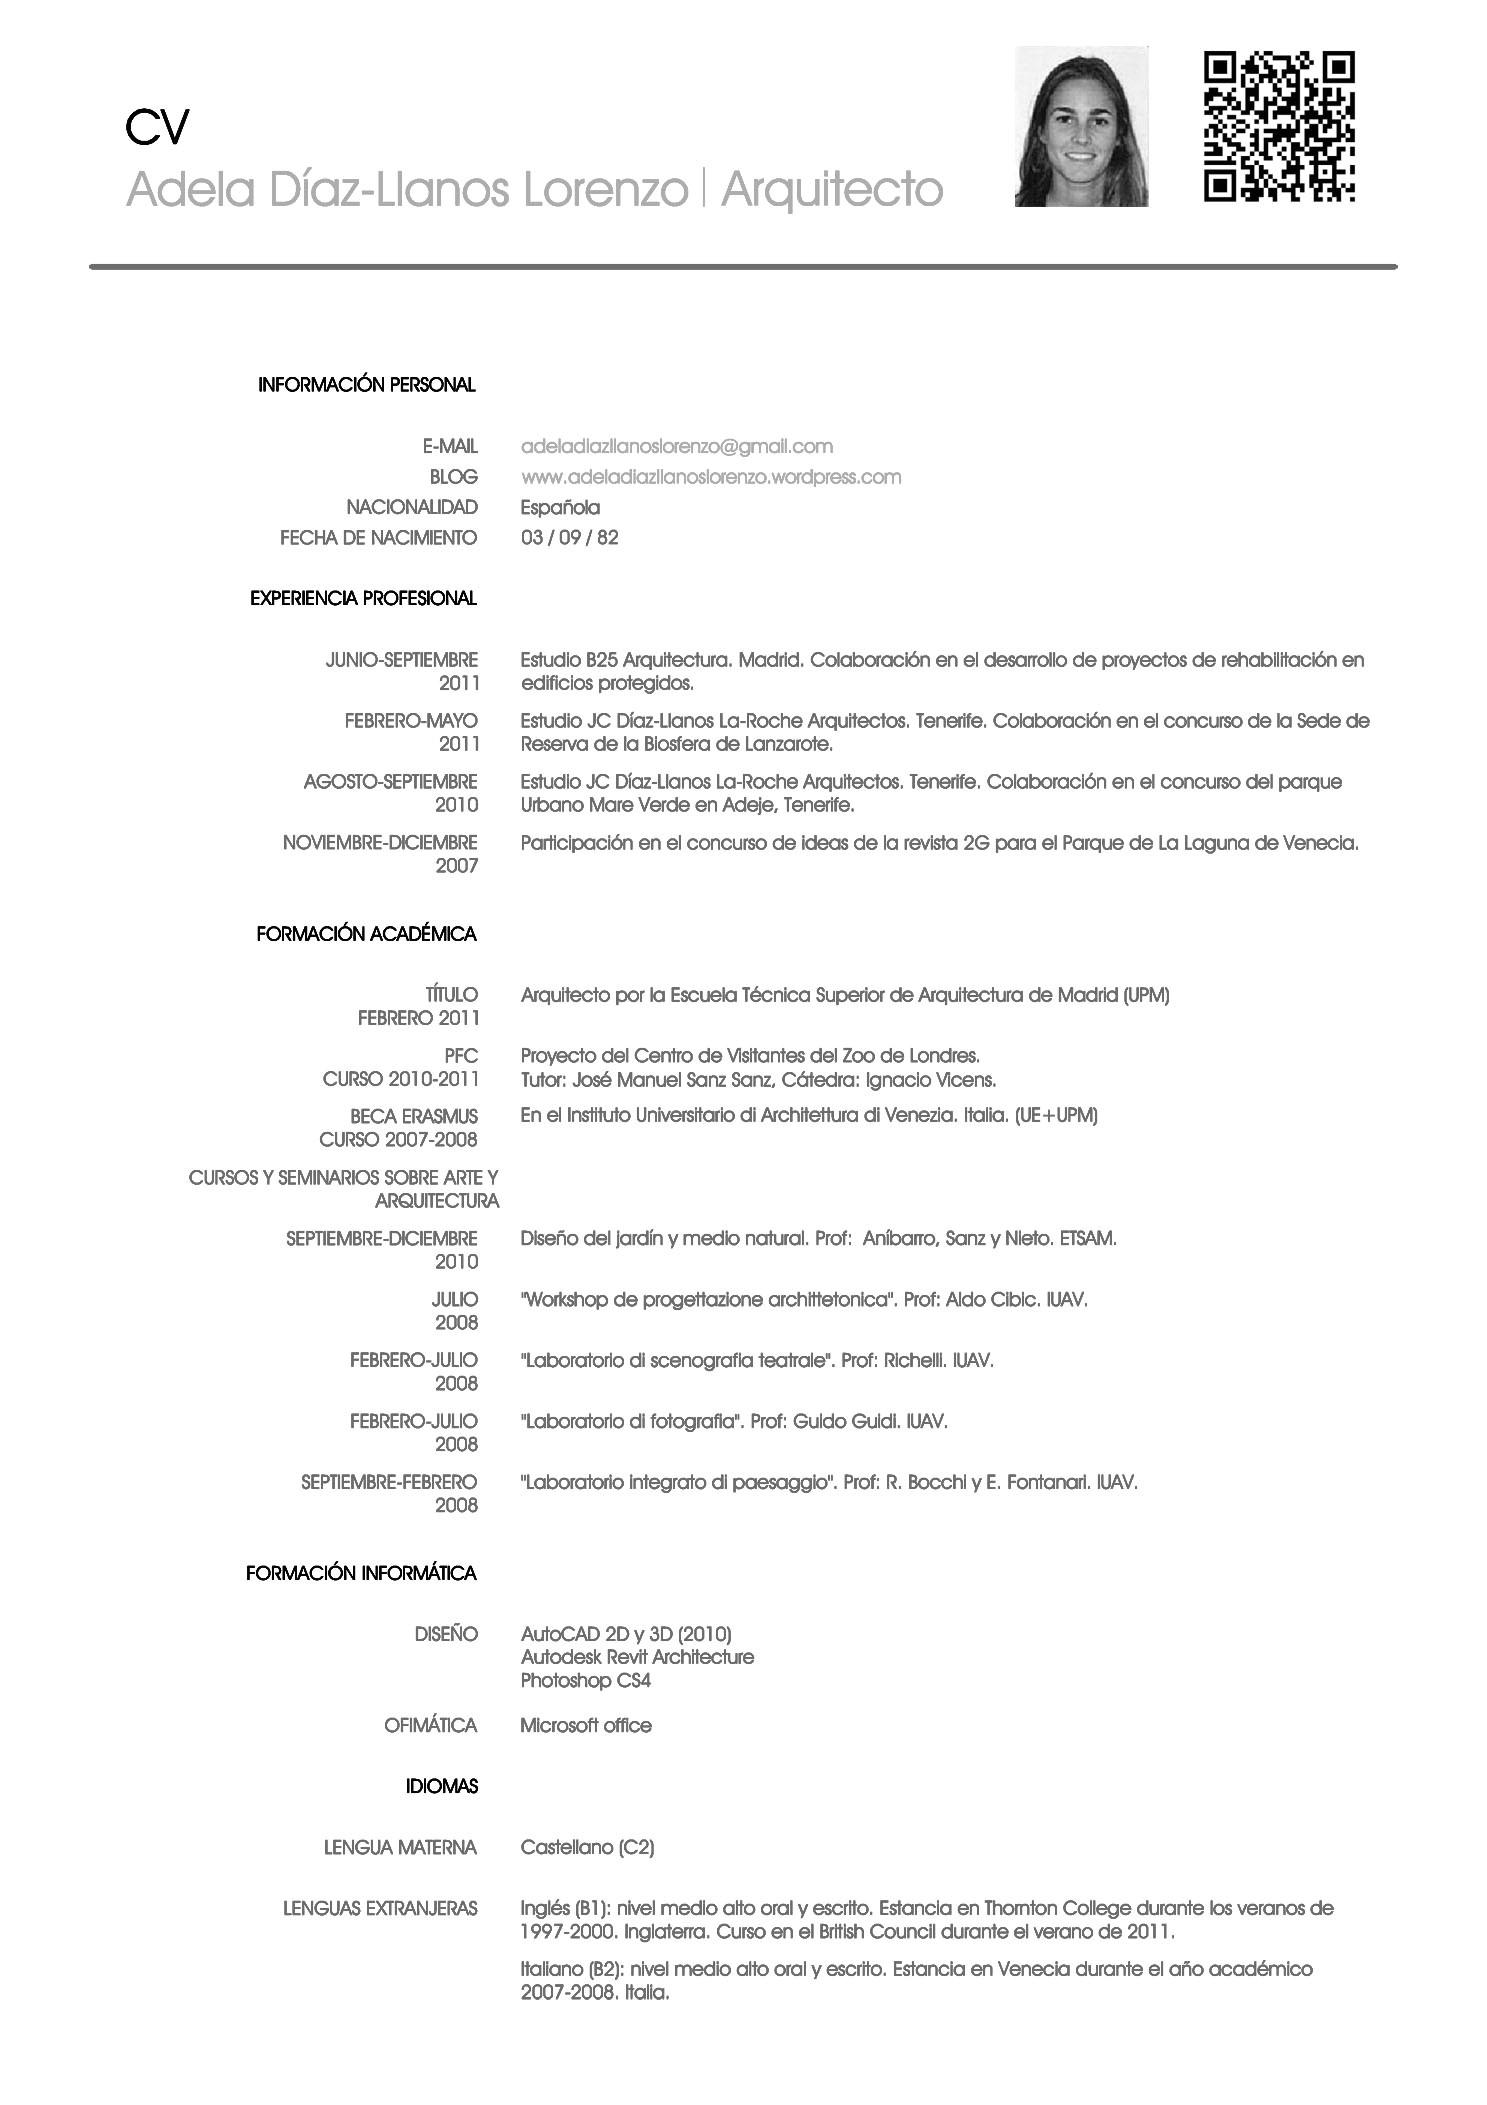 curriculum vitae template en espanol